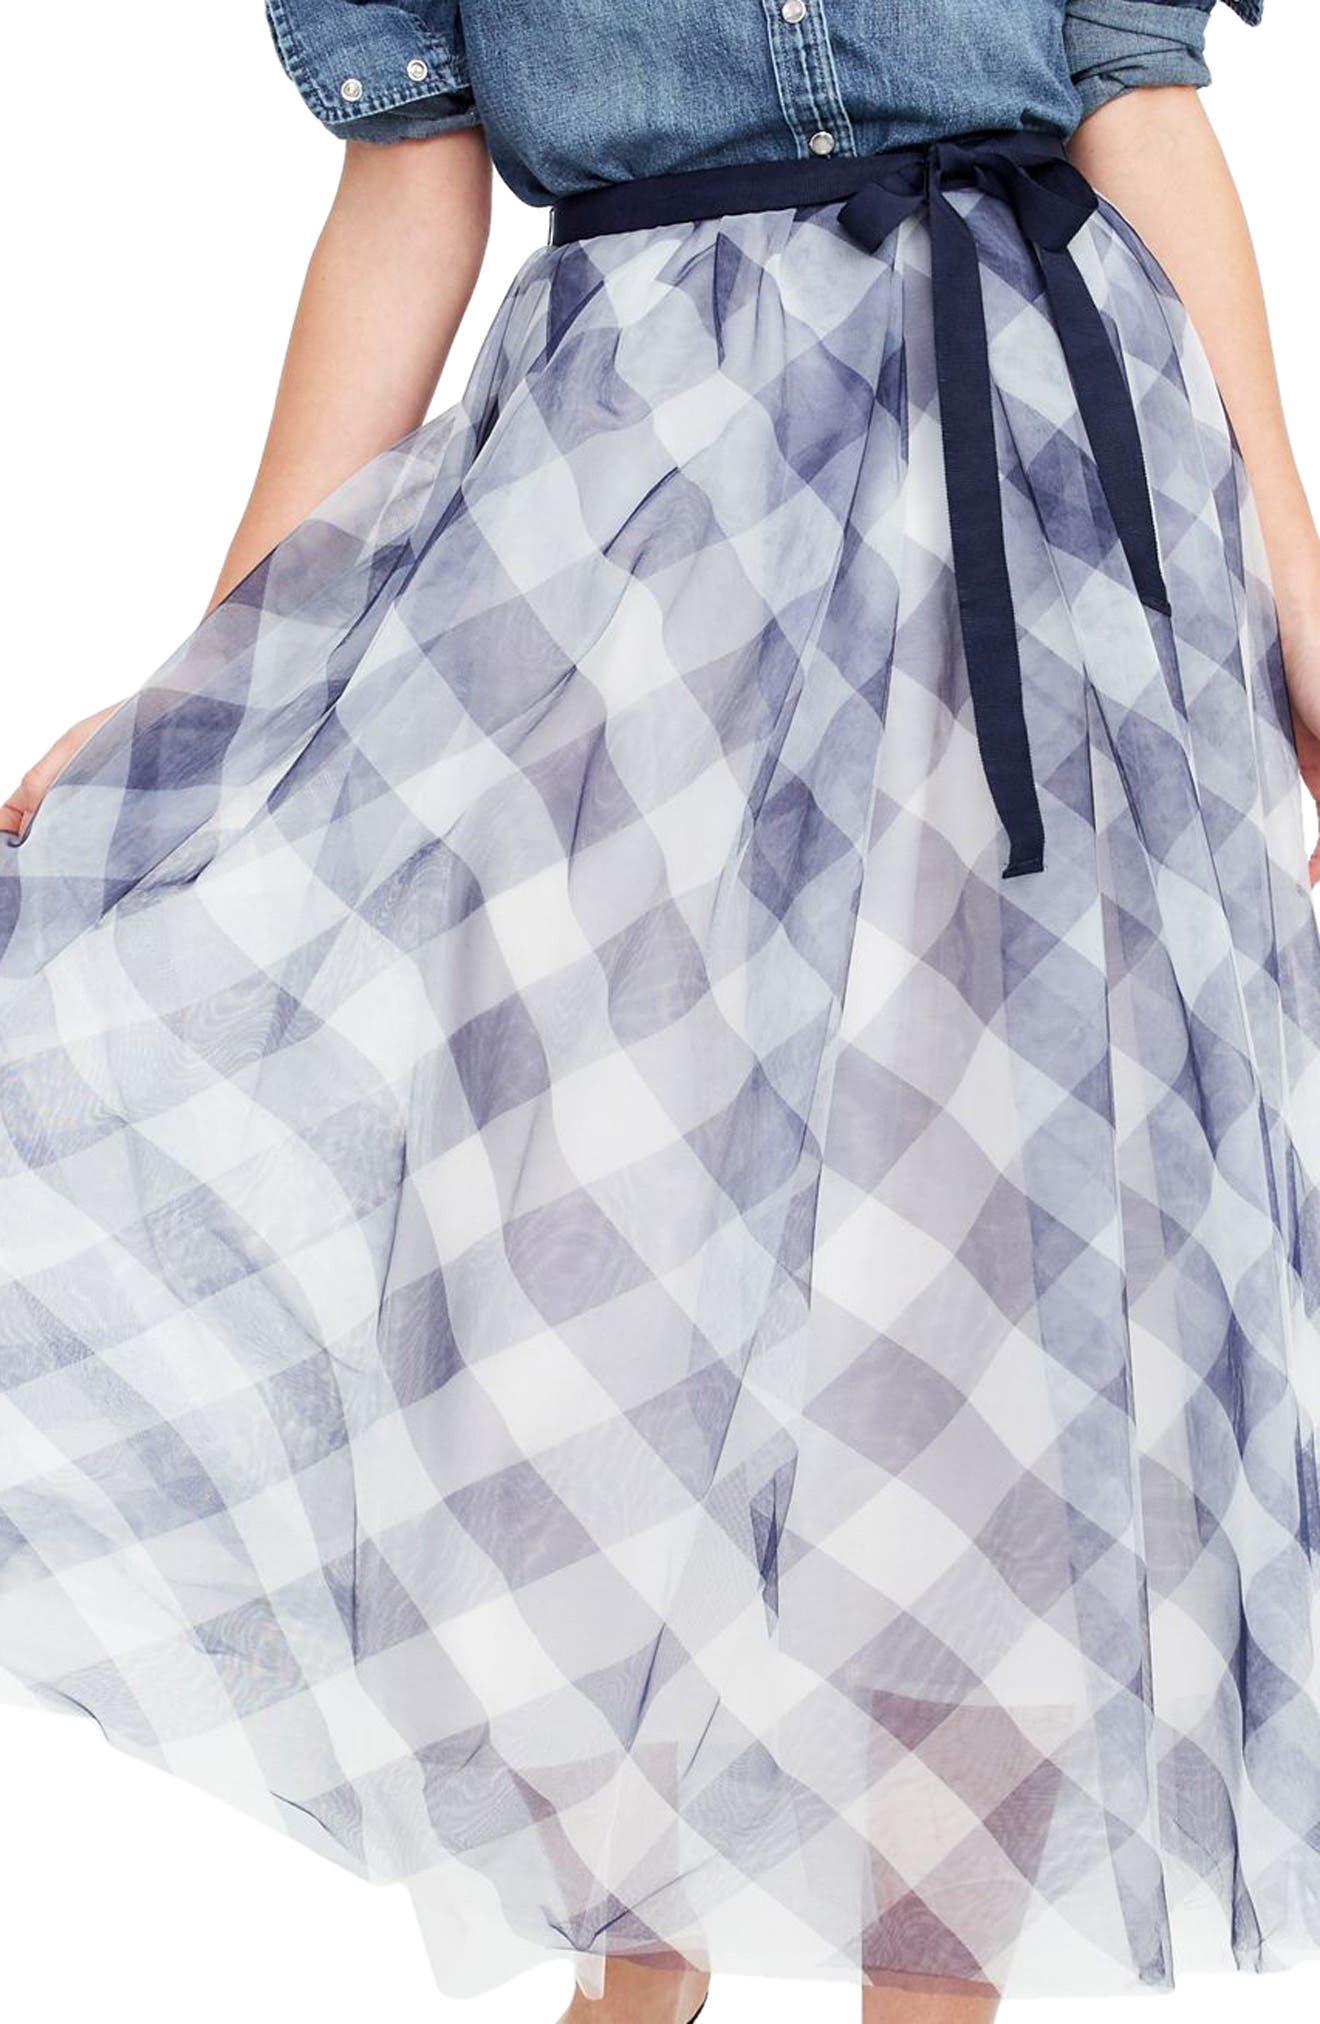 Gingham Tulle Skirt,                         Main,                         color,